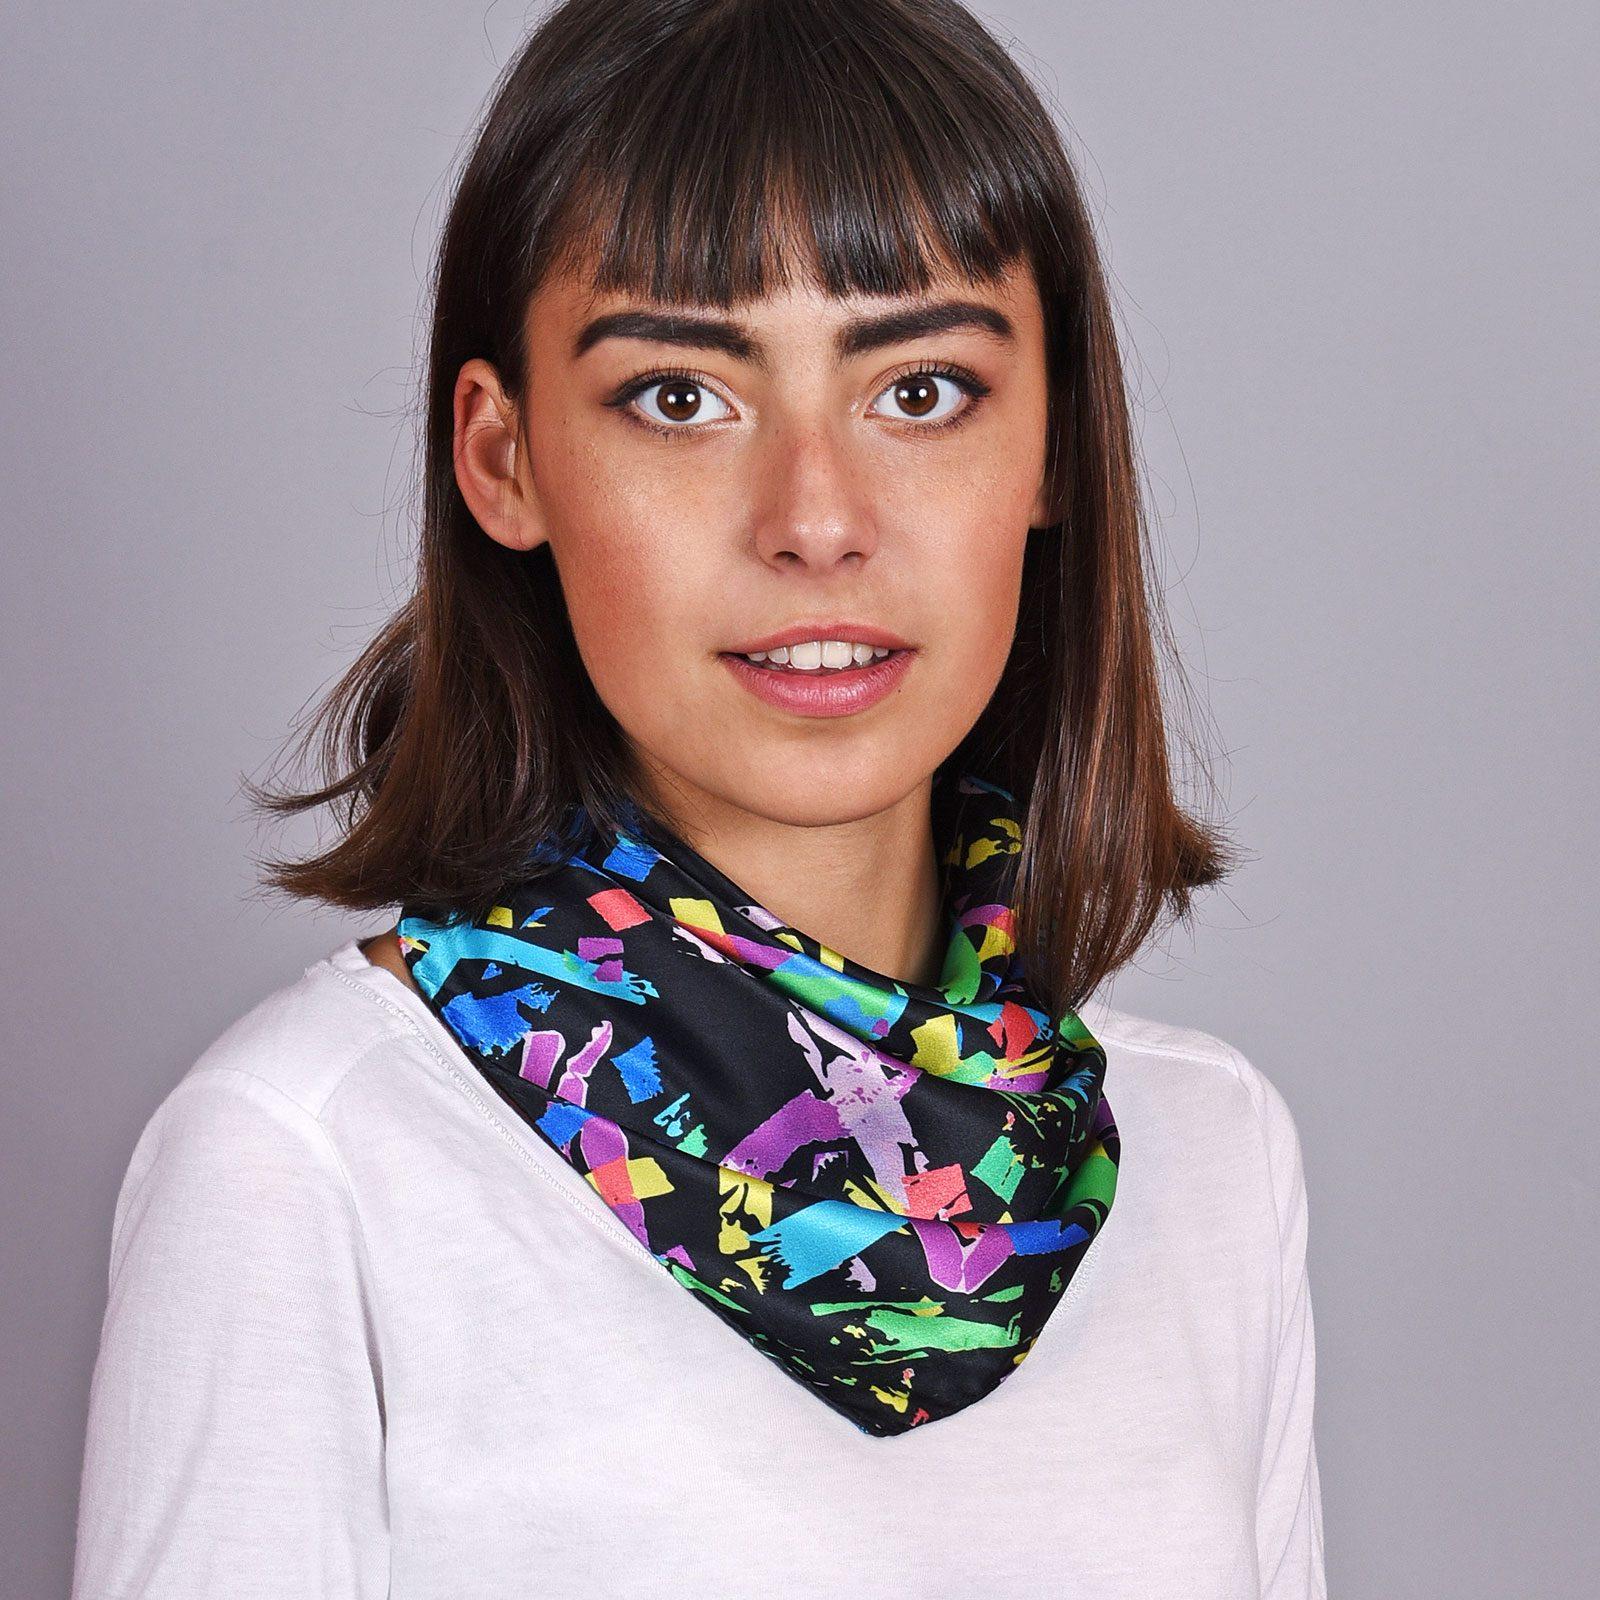 http://lookbook.allee-du-foulard.fr/wp-content/uploads/2018/12/AT-04604-VF16-1-carre-soie-65x65cm-noir-gribouillage-1600x1600.jpg